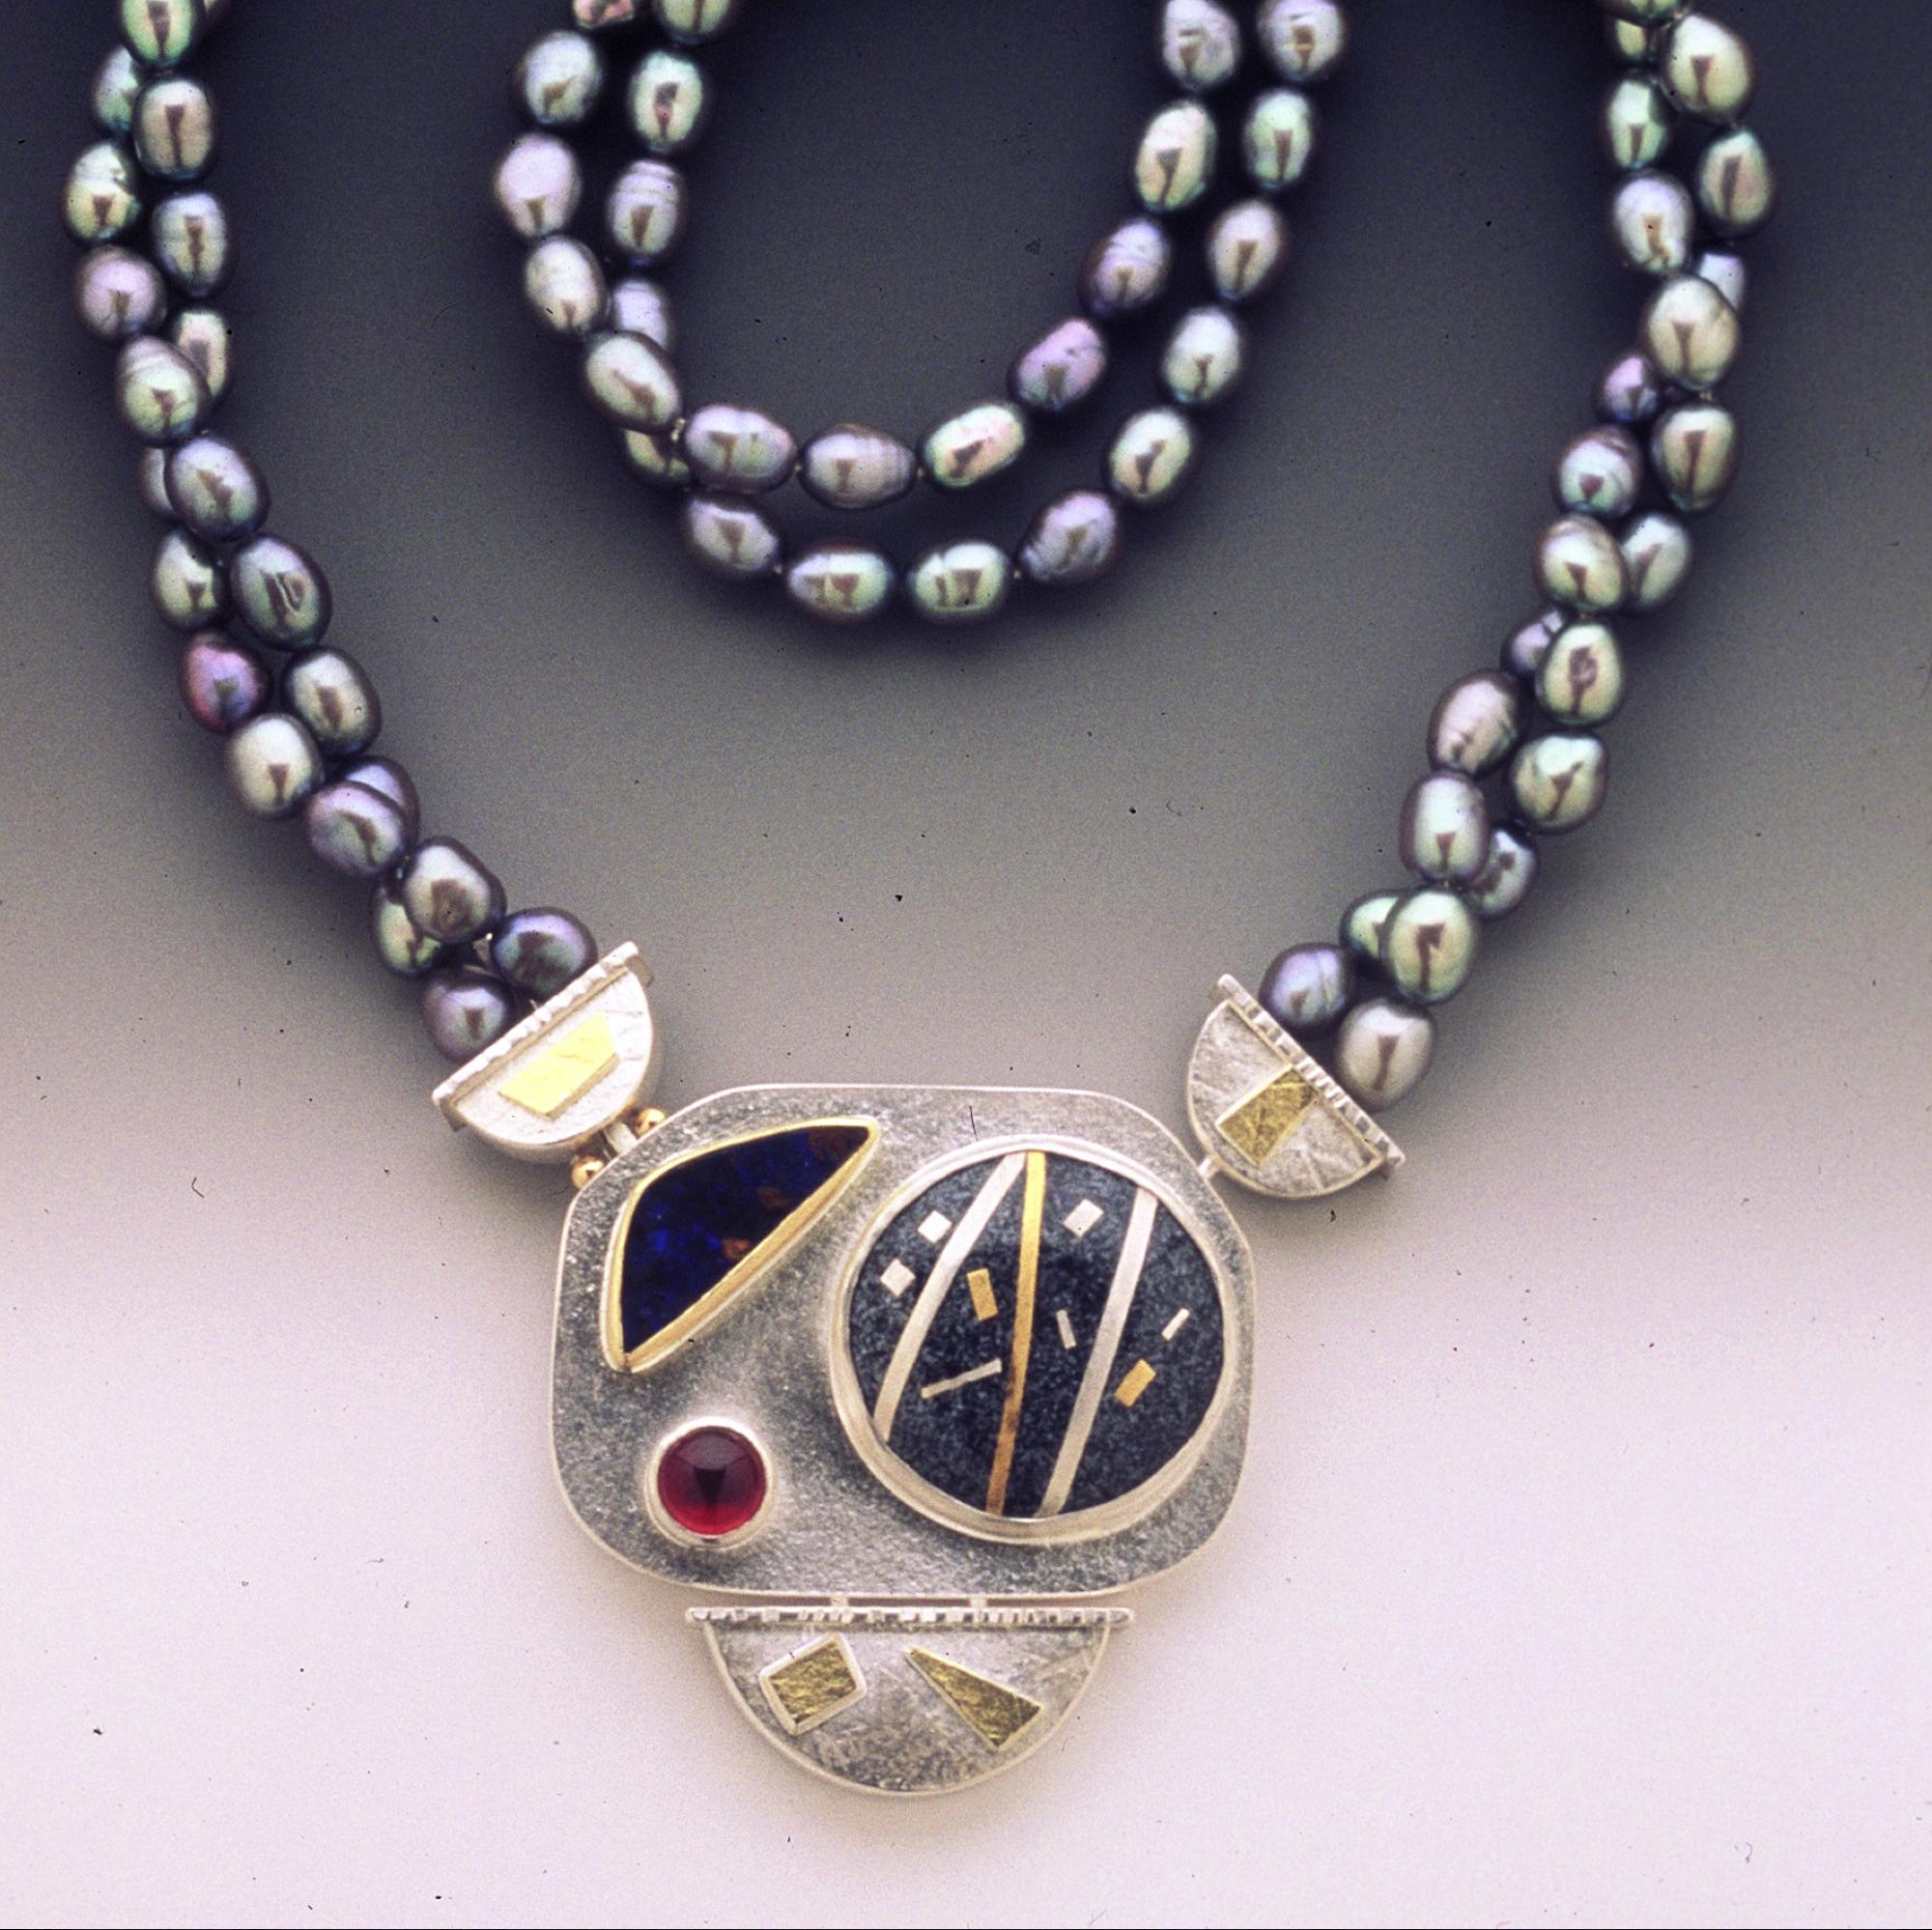 Class Image Intermediate Metals/Jewelry – Emphasis on Bezels